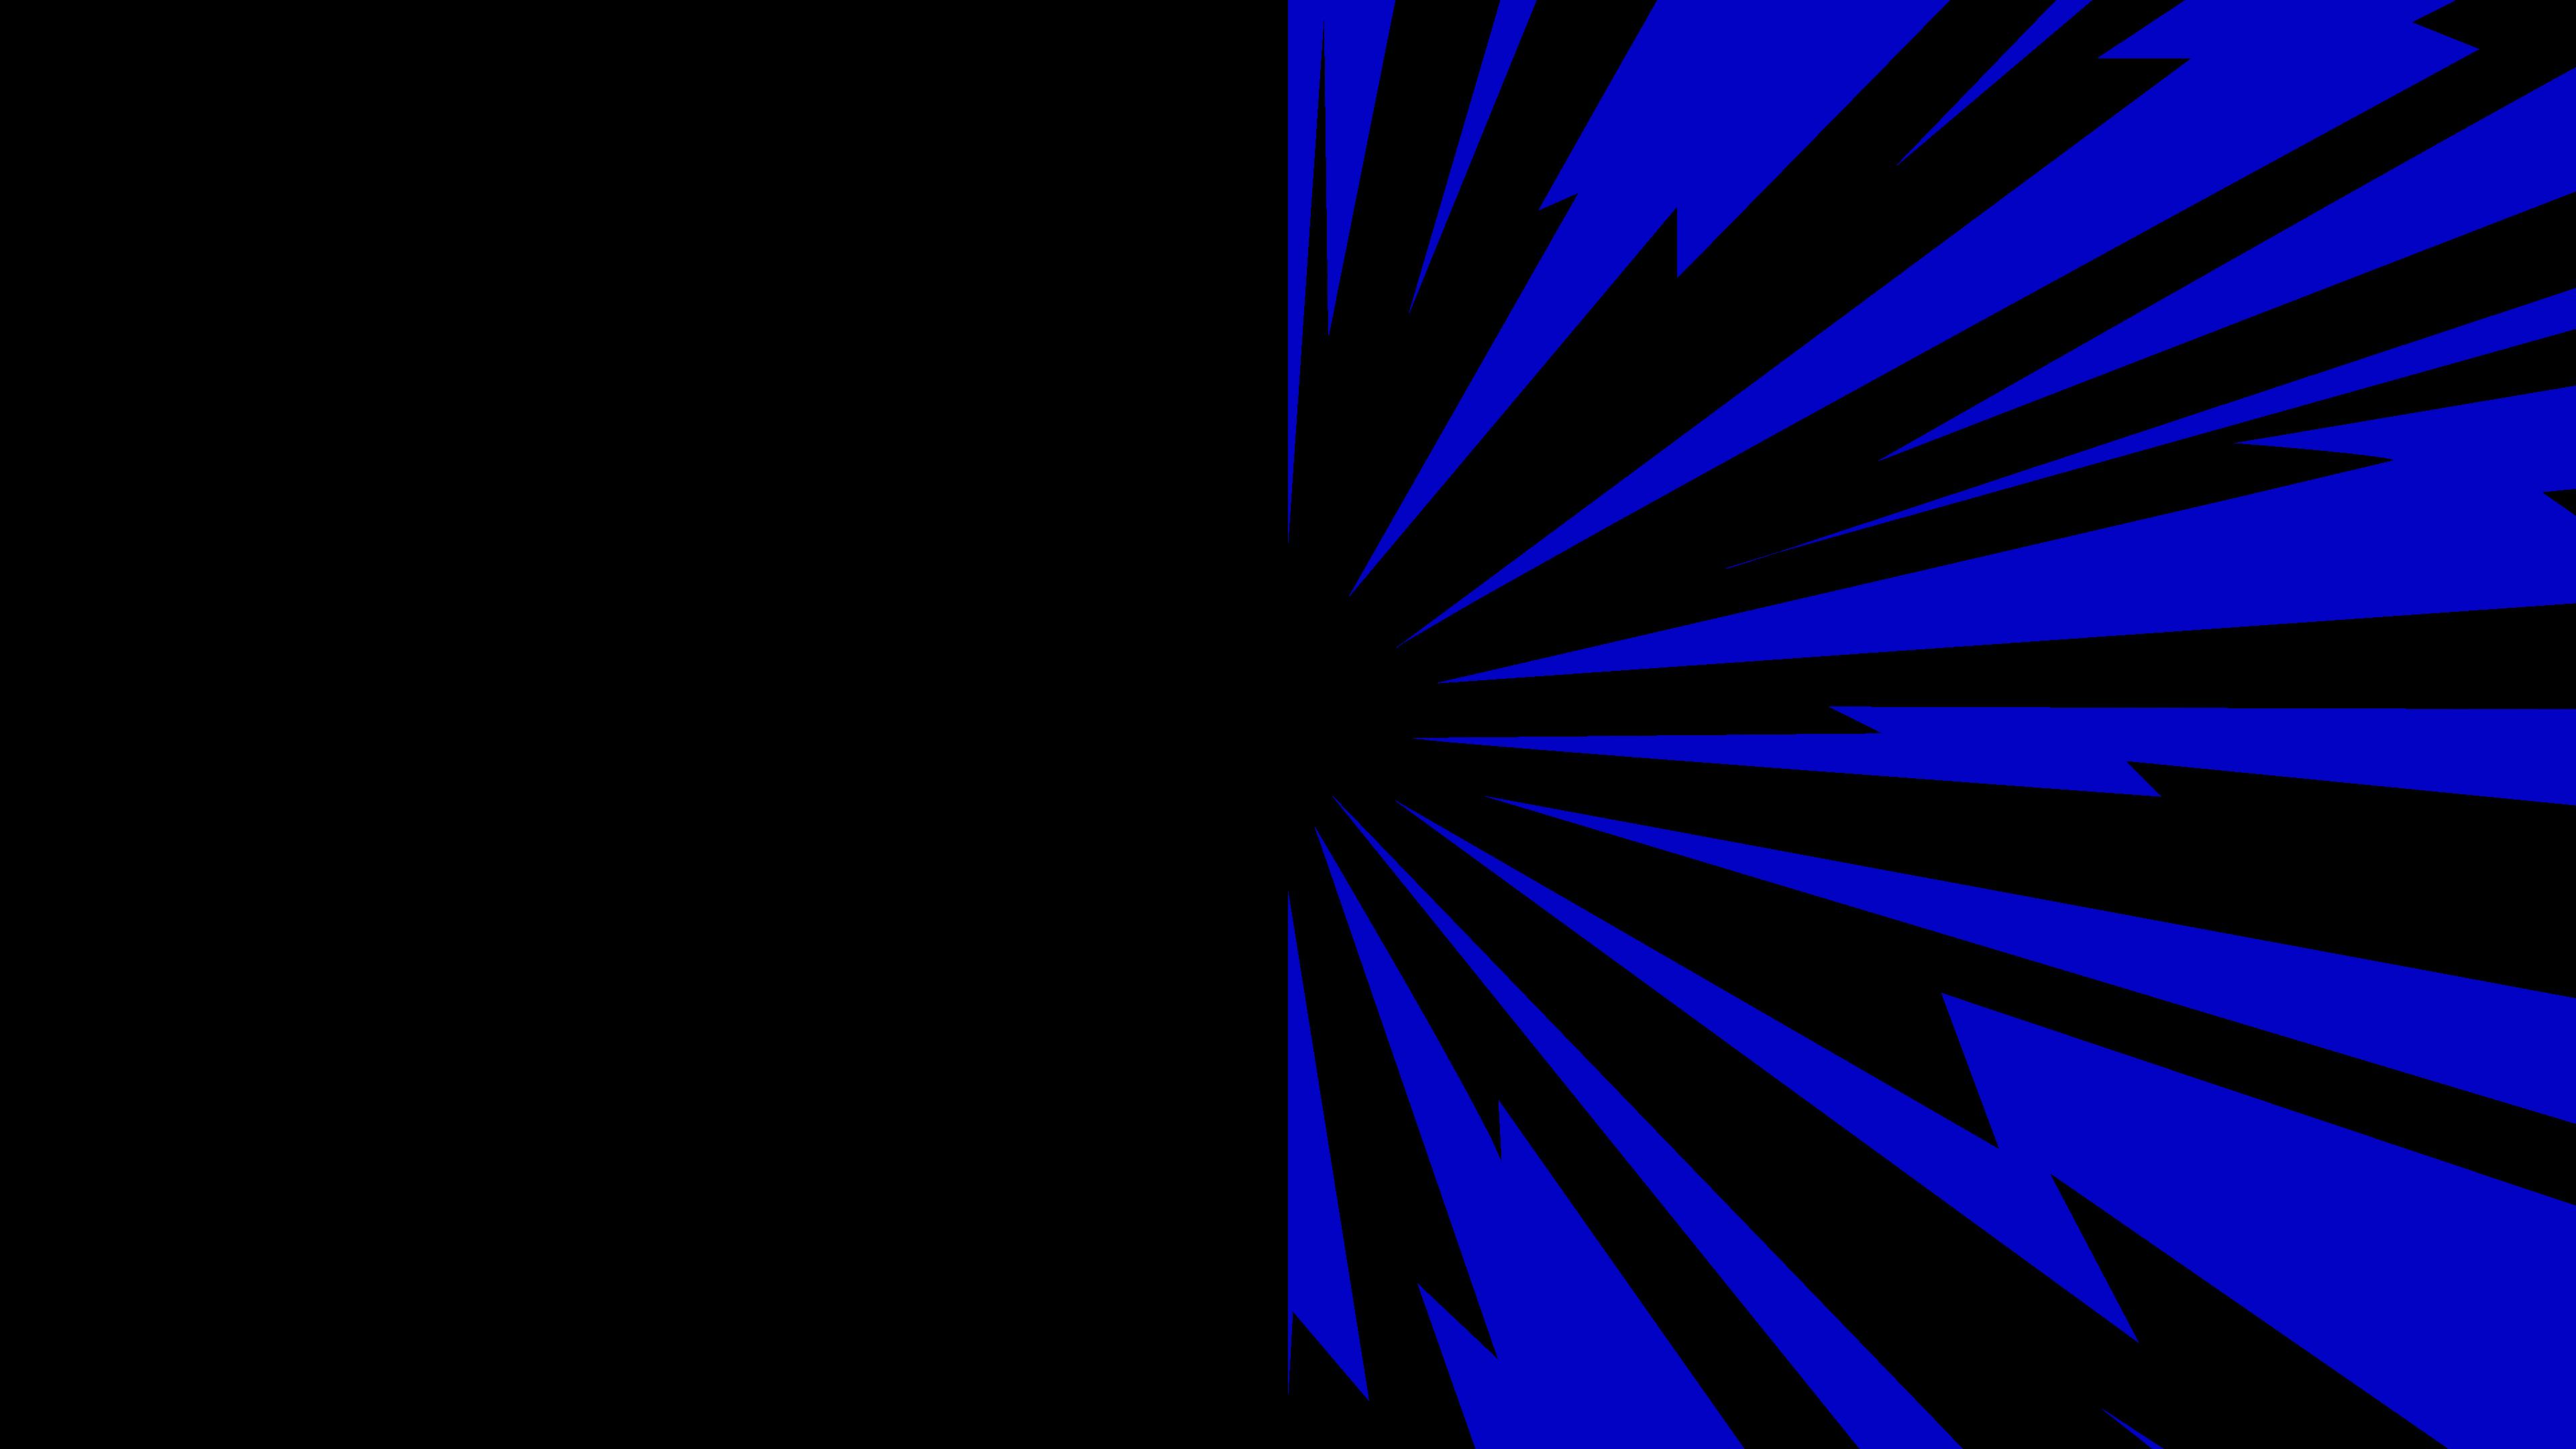 blue-rays